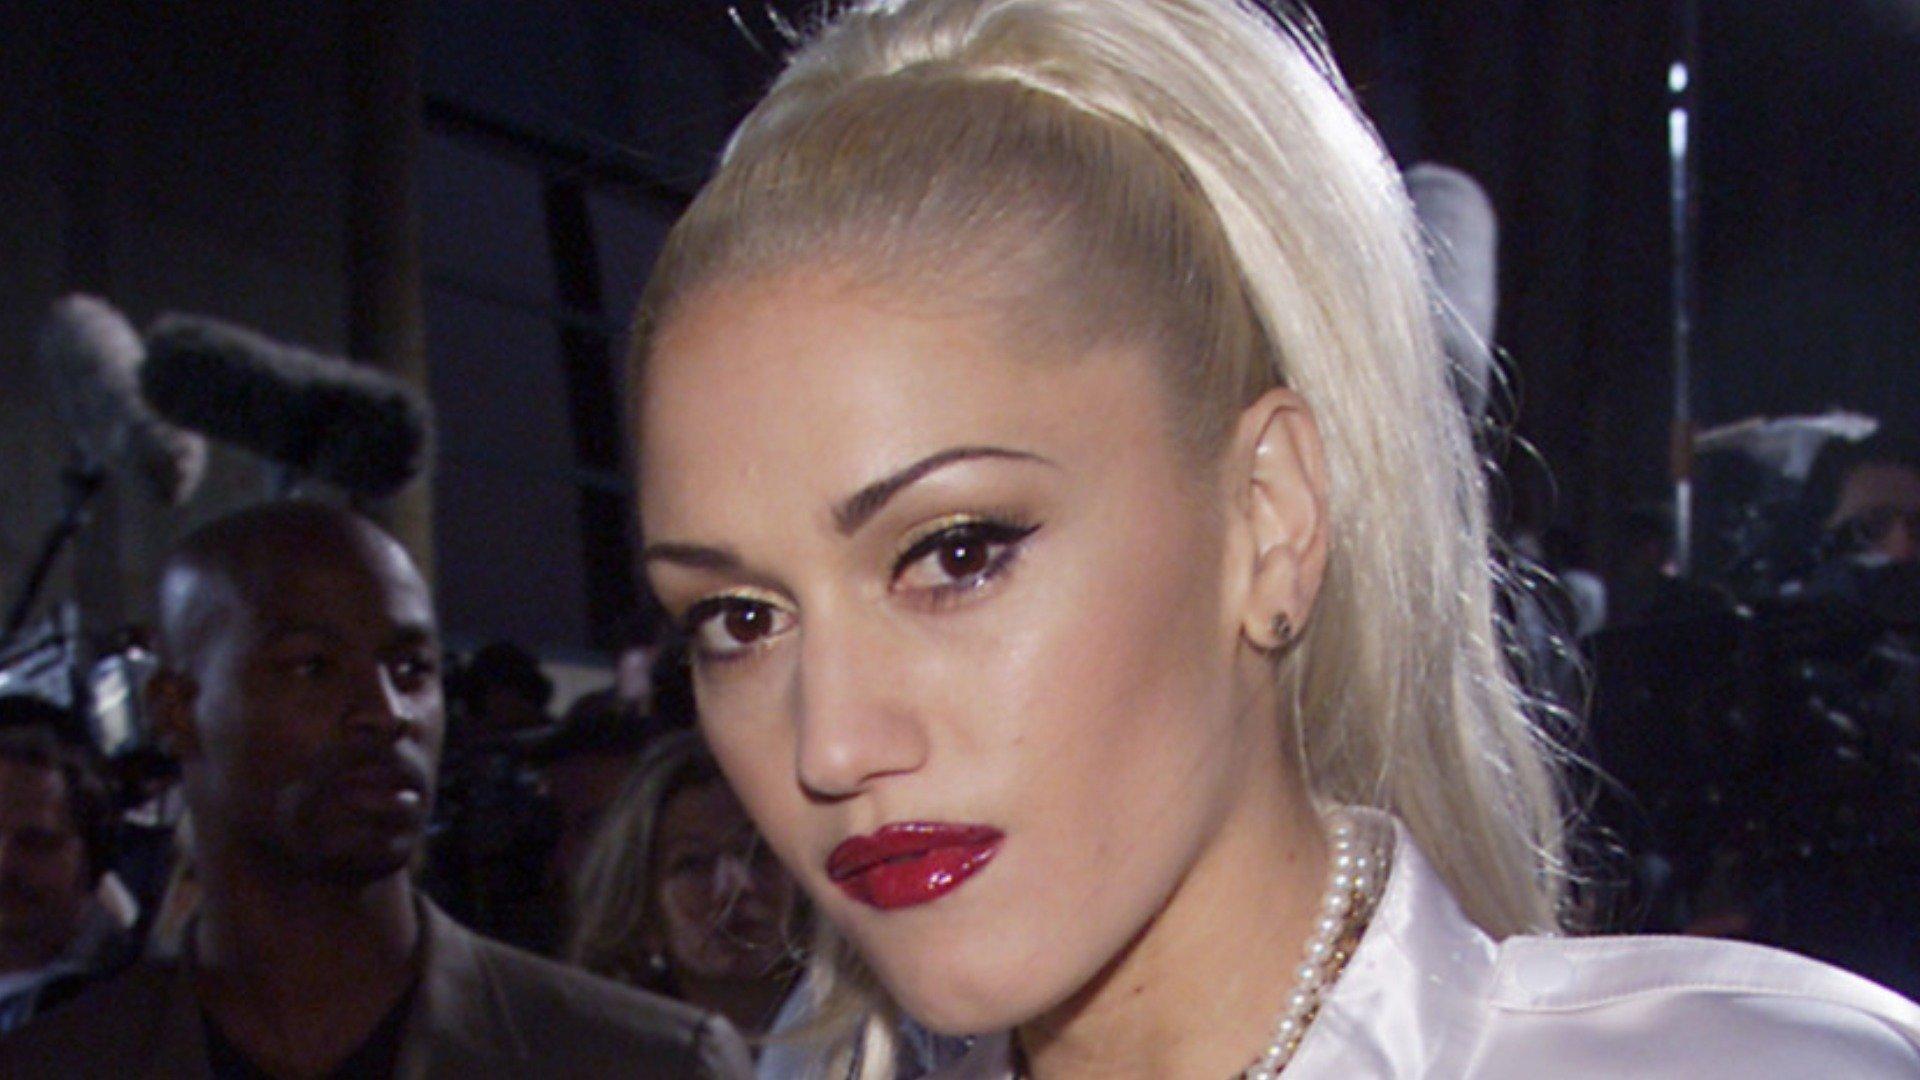 Gwen Stefani's Style Transformation Is Causing A Stir